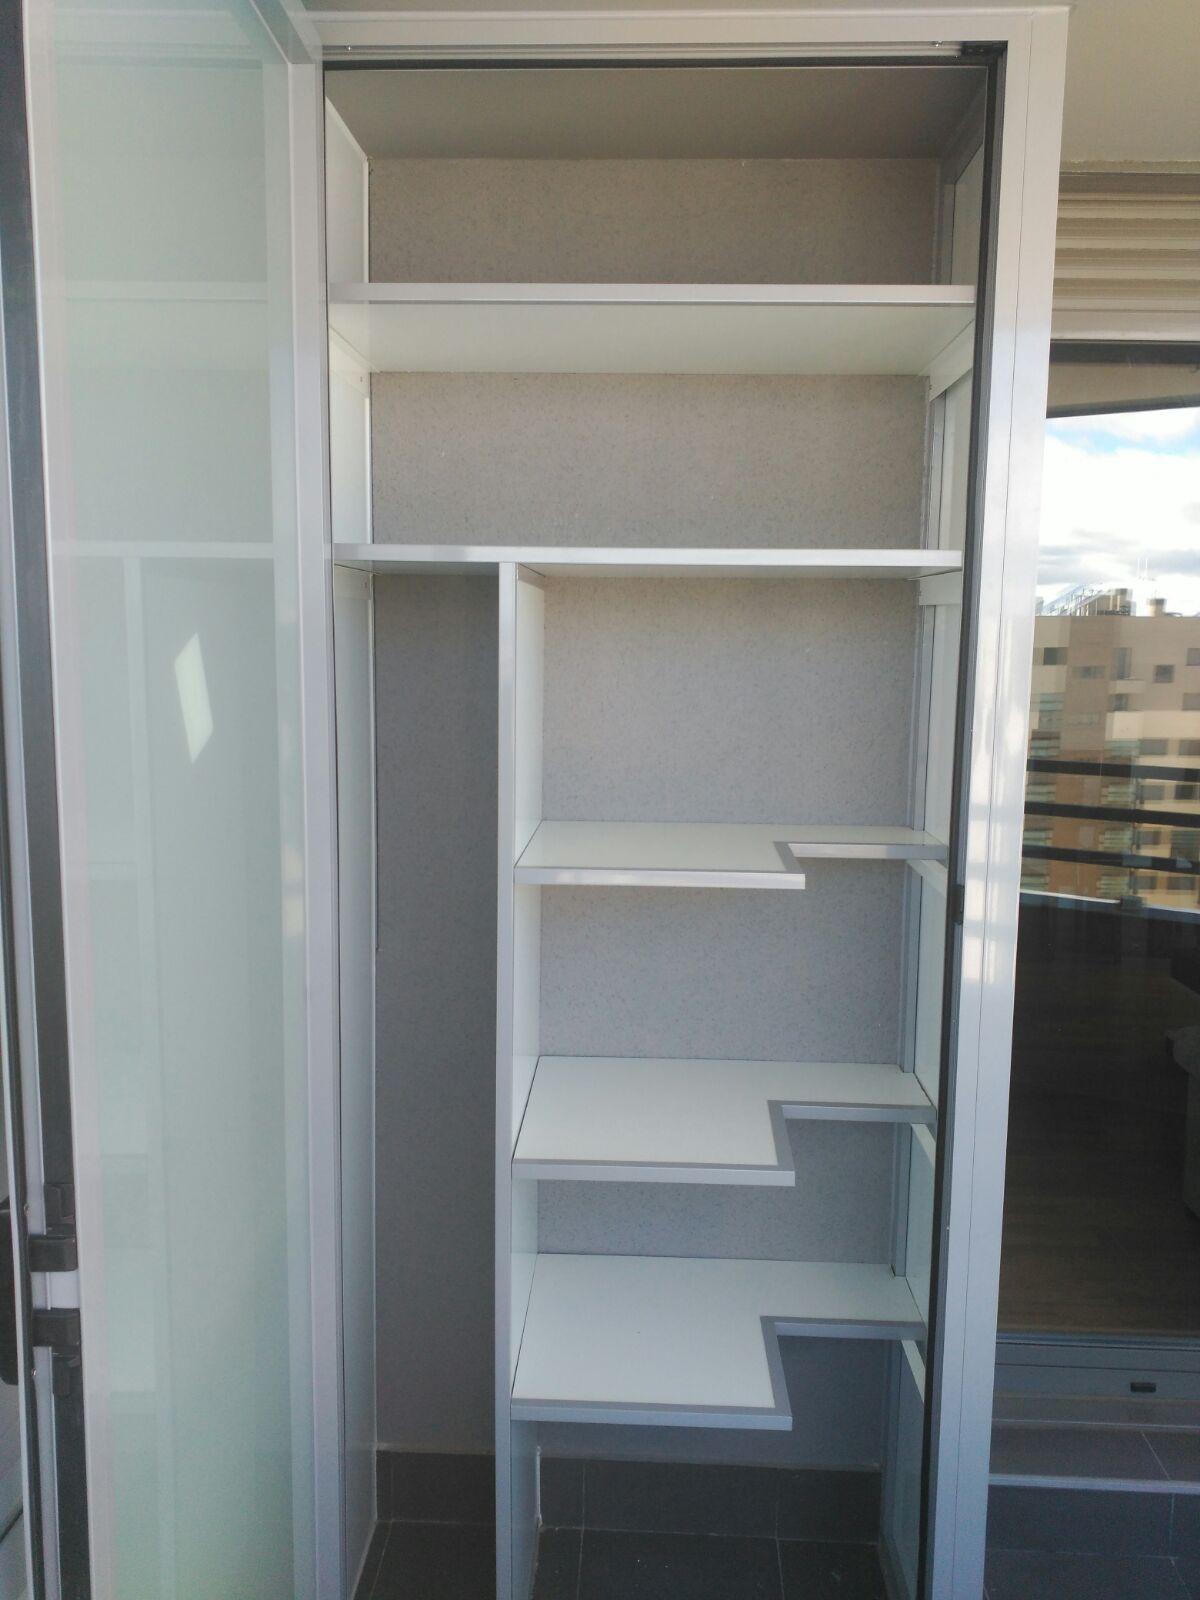 Armario a medida con escobero aluminios villalba empresa de aluminios y pvc en madrid - Armario pvc exterior ...